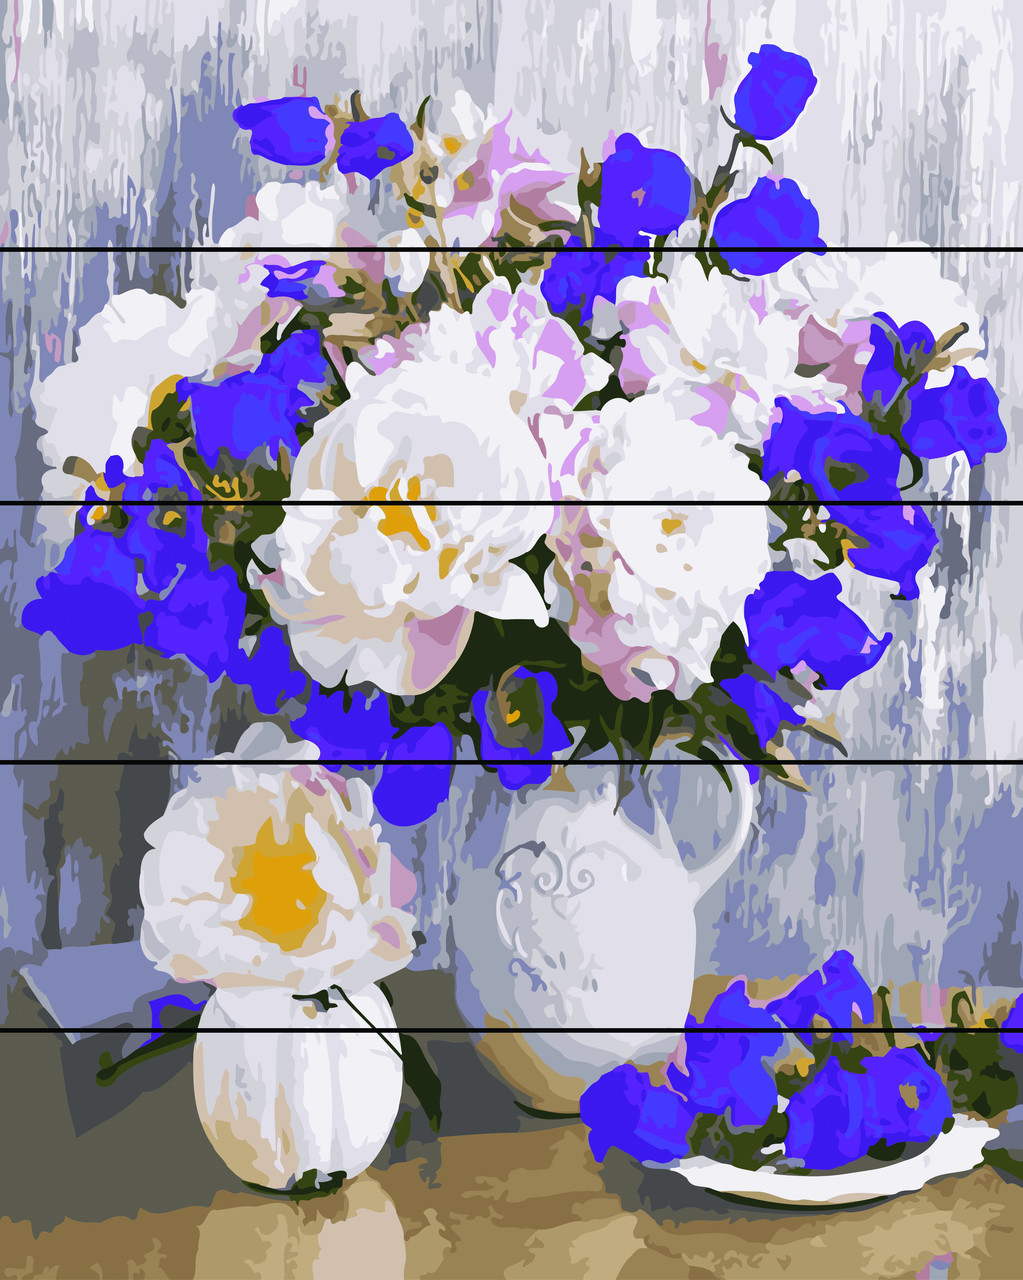 Картина по номерам по дереву Букет в белой вазе (RA-AS0229) 40 х 50 см Rainbow Art